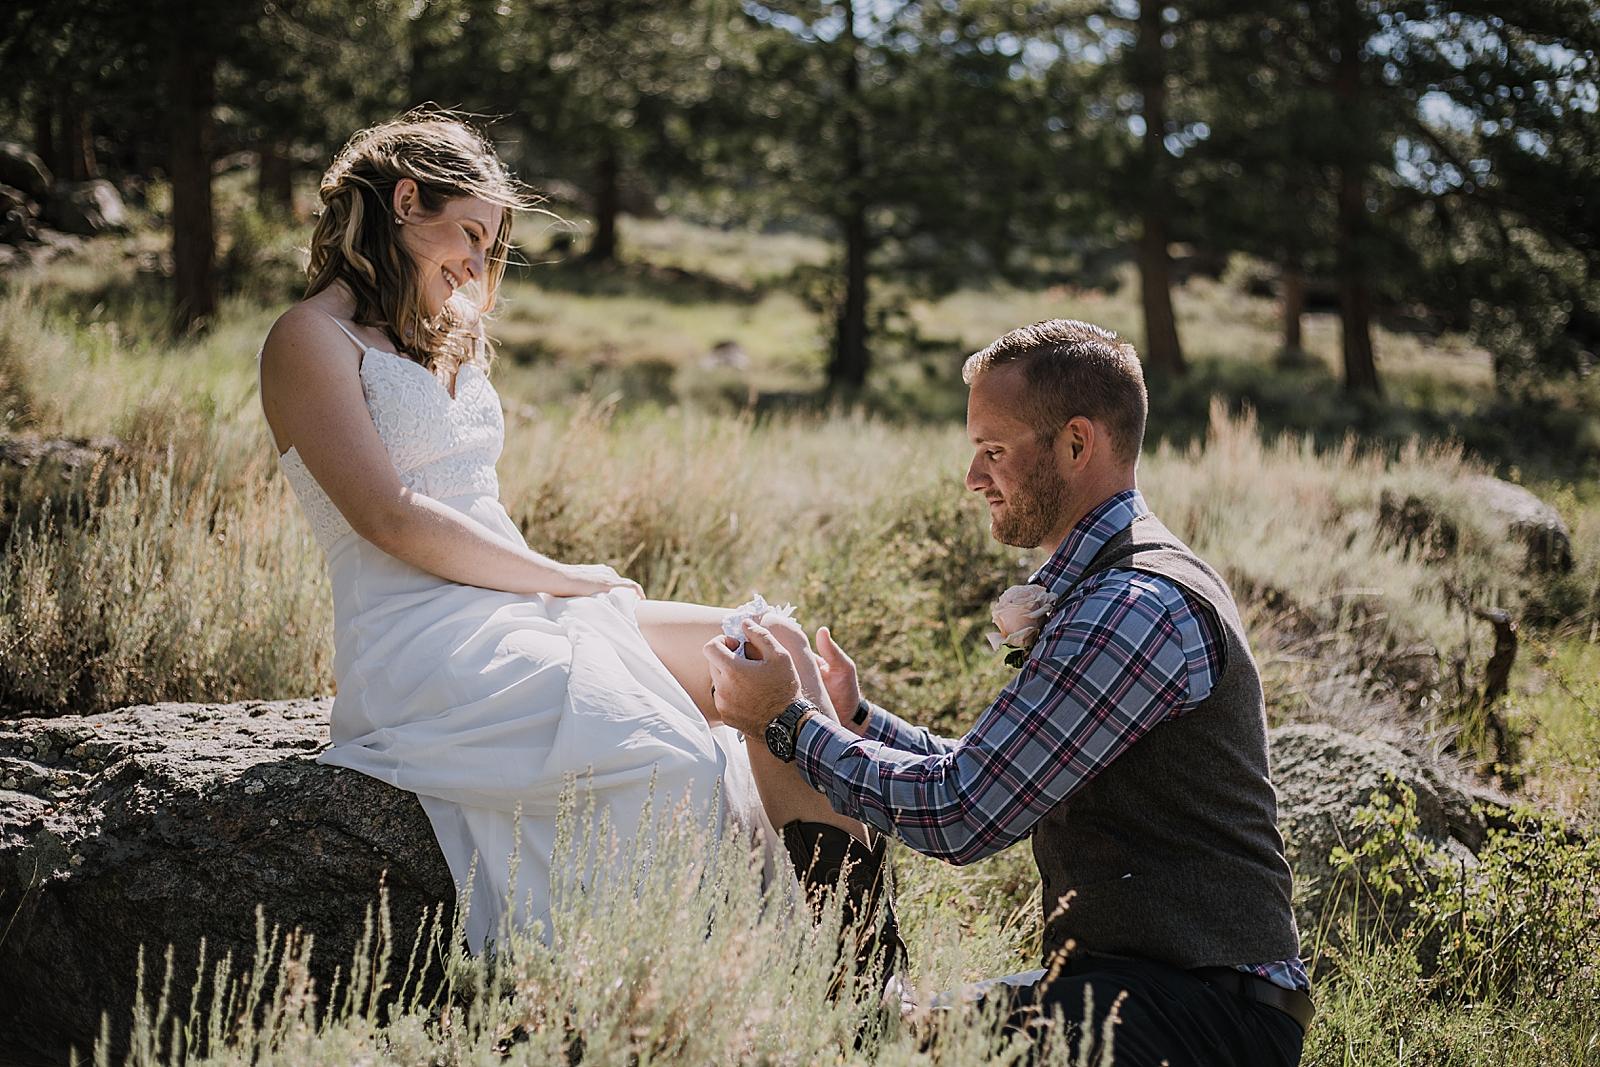 elopement garter, RMNP elopement ceremony, rocky mountain national park elopement, 3M curves elopement, self solemnizing, self solemnization, long's peak, summer elopement, estes park elopement